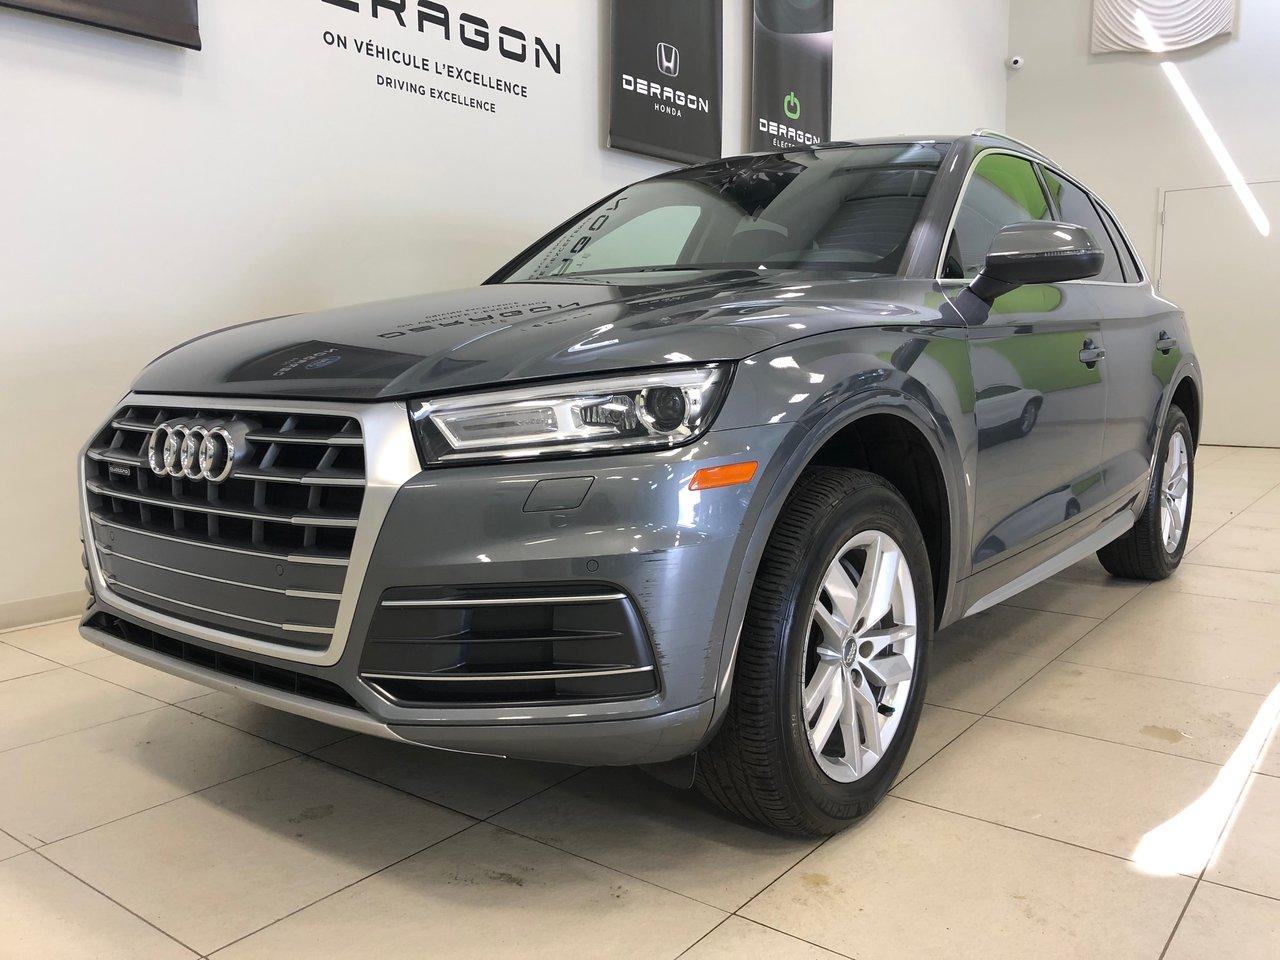 Audi Q5 2018 KOMFORT, CAMÉRA, BLUETOOTH, A/C